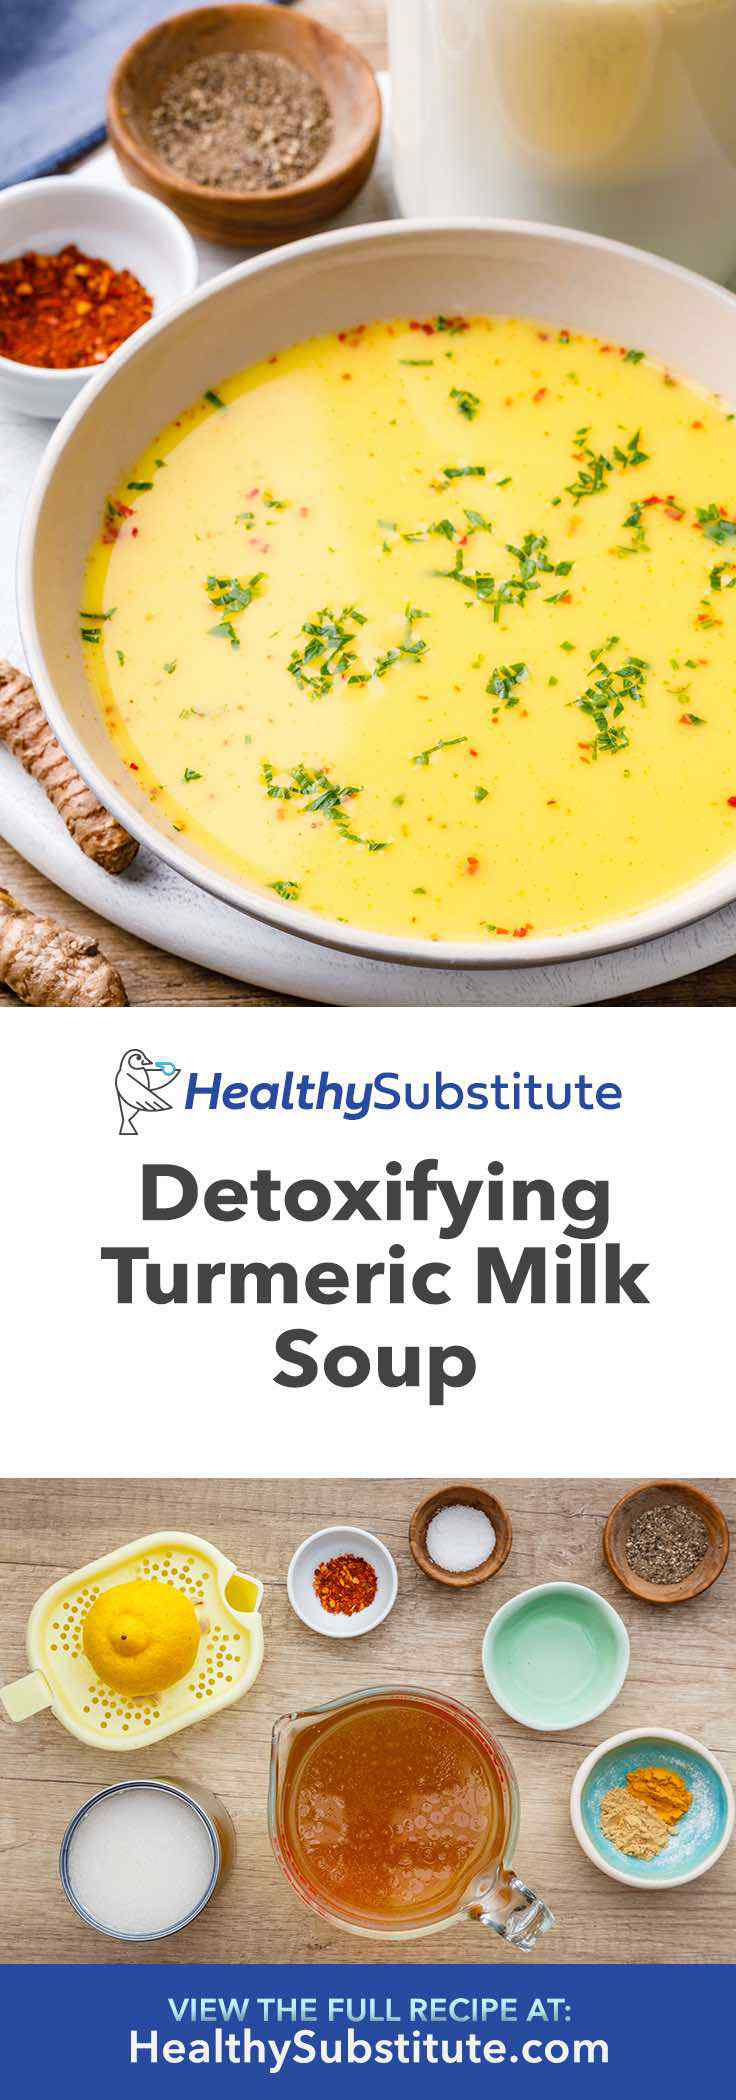 This detoxifying turmeric milk soup is incredible.